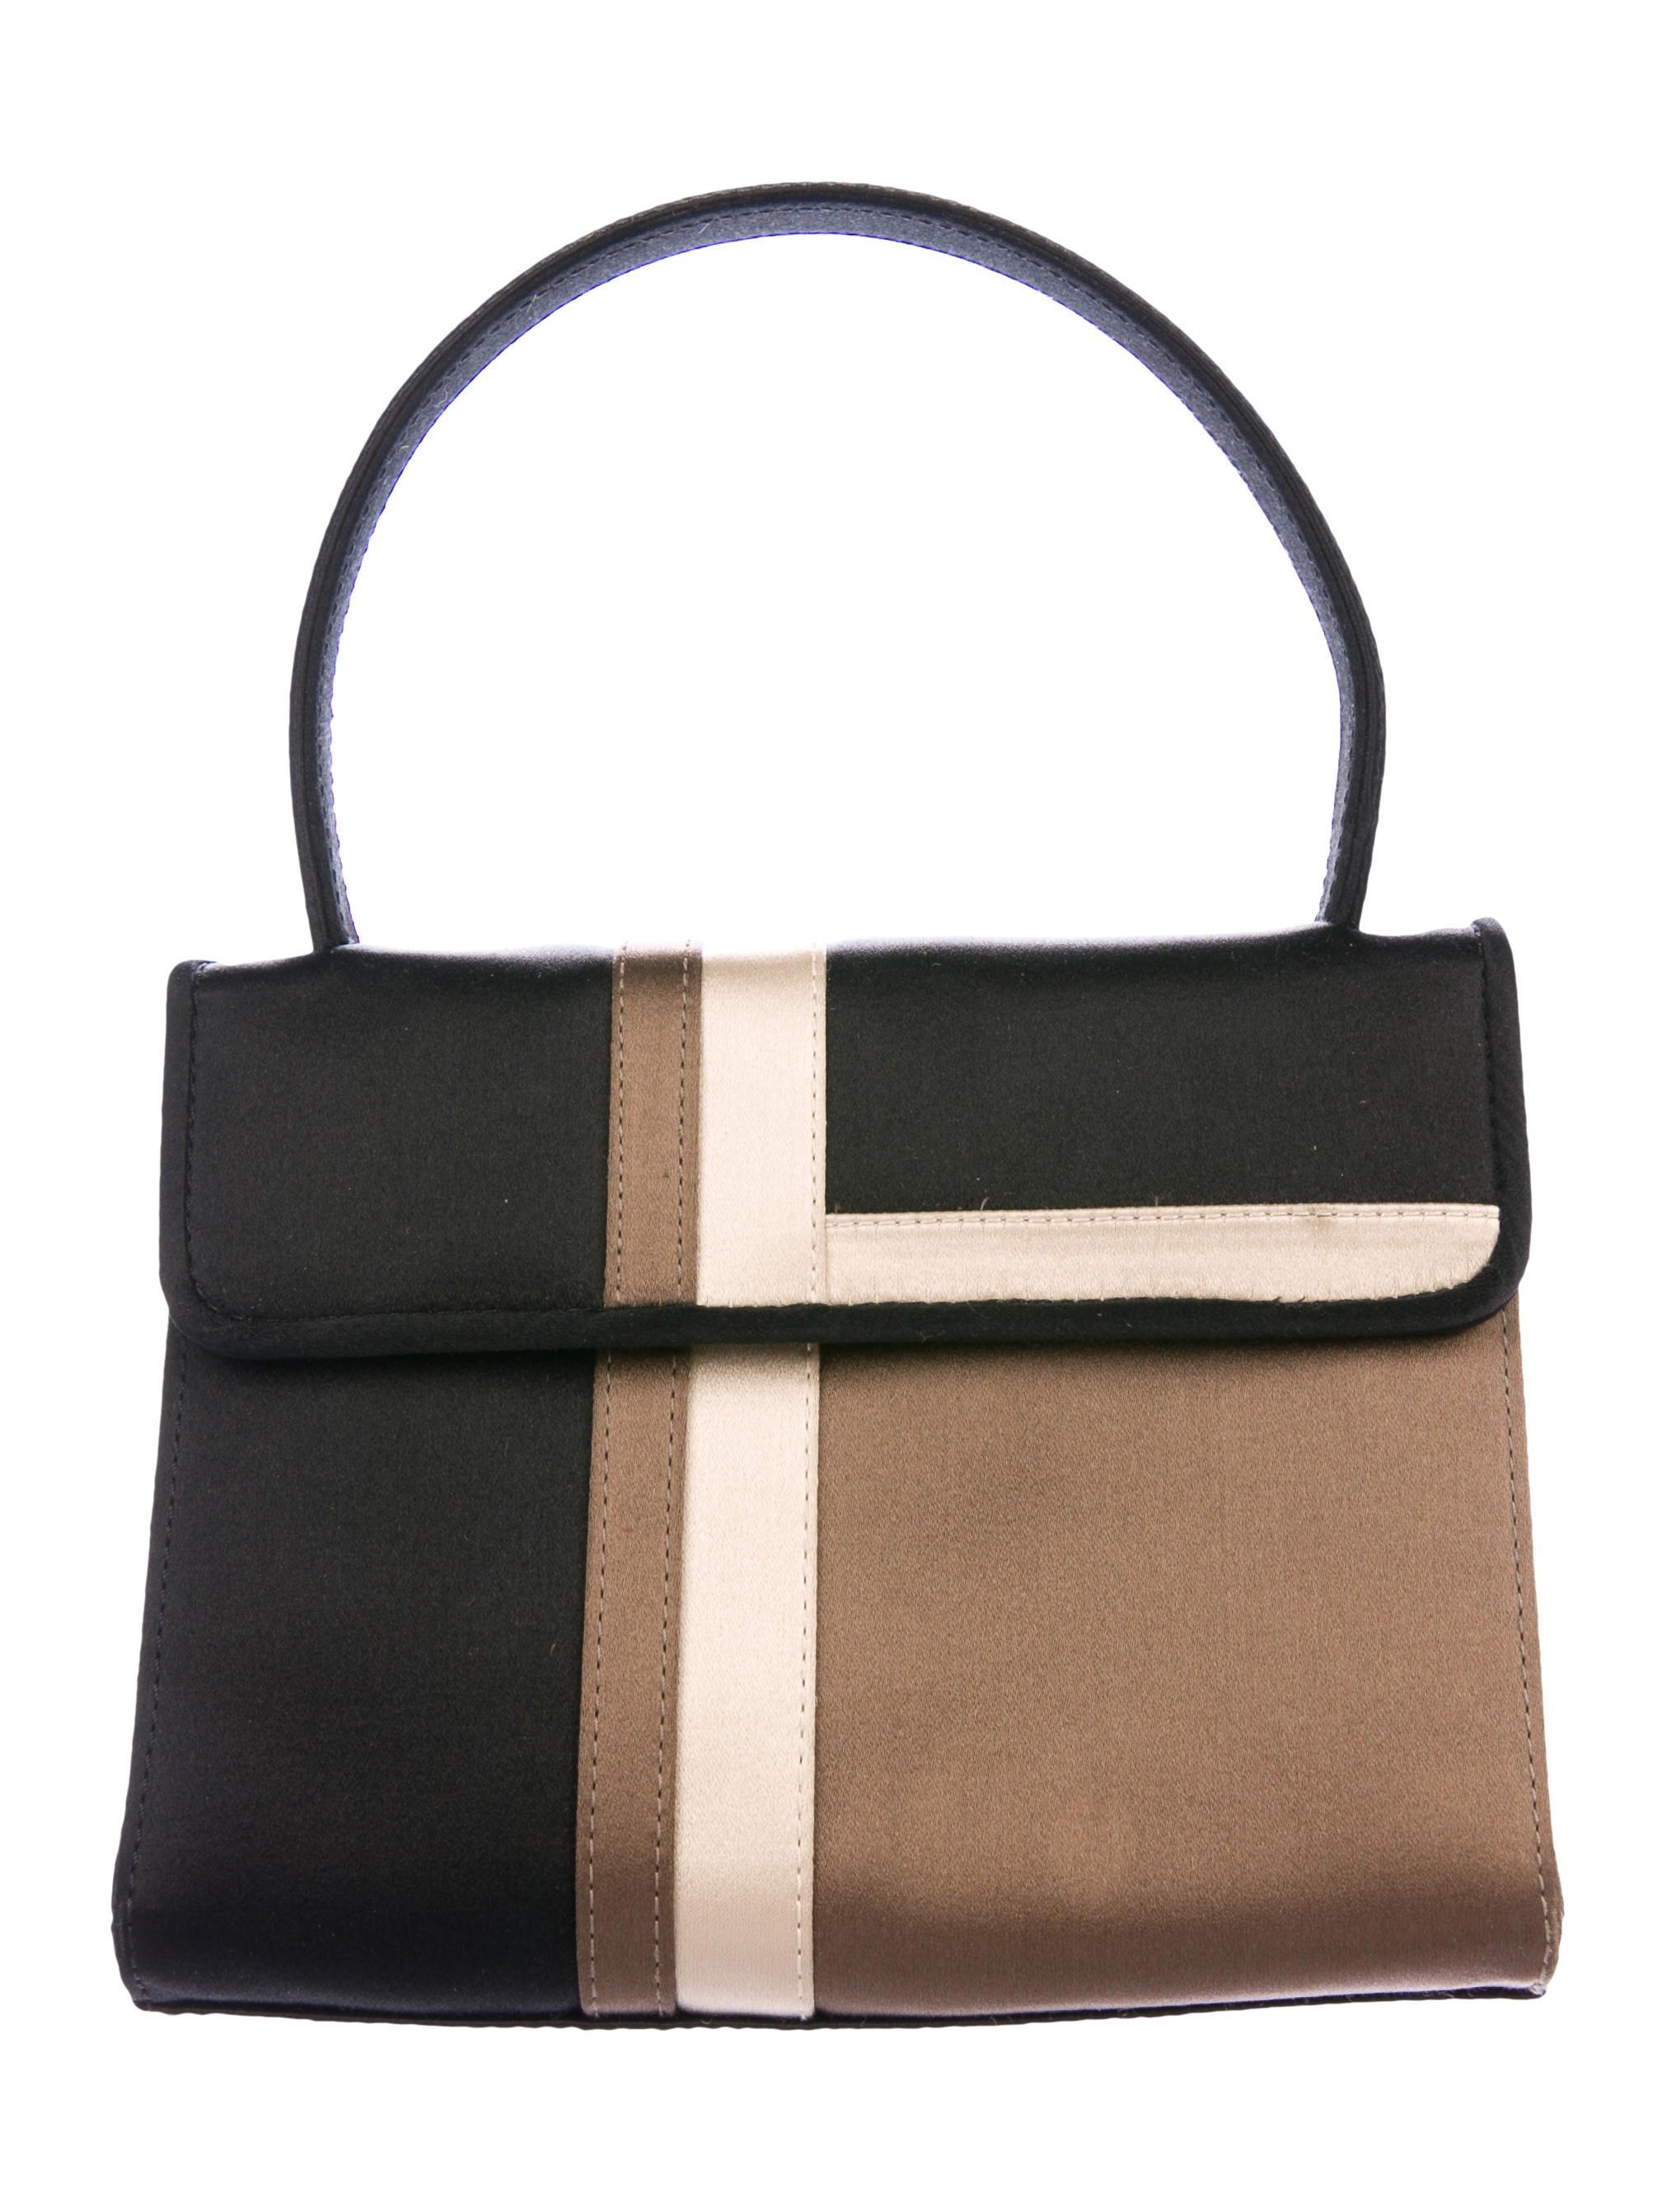 Satin Handle Bag by Burberry